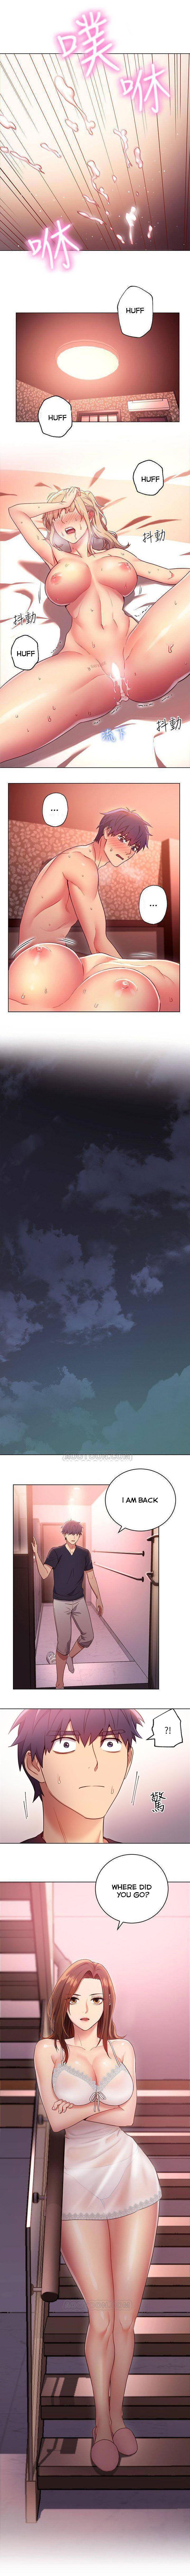 [Neck Pilllow] Stepmother Friends Ch.39/? [English] [Hentai Universe] NEW! 13/10/2020 131